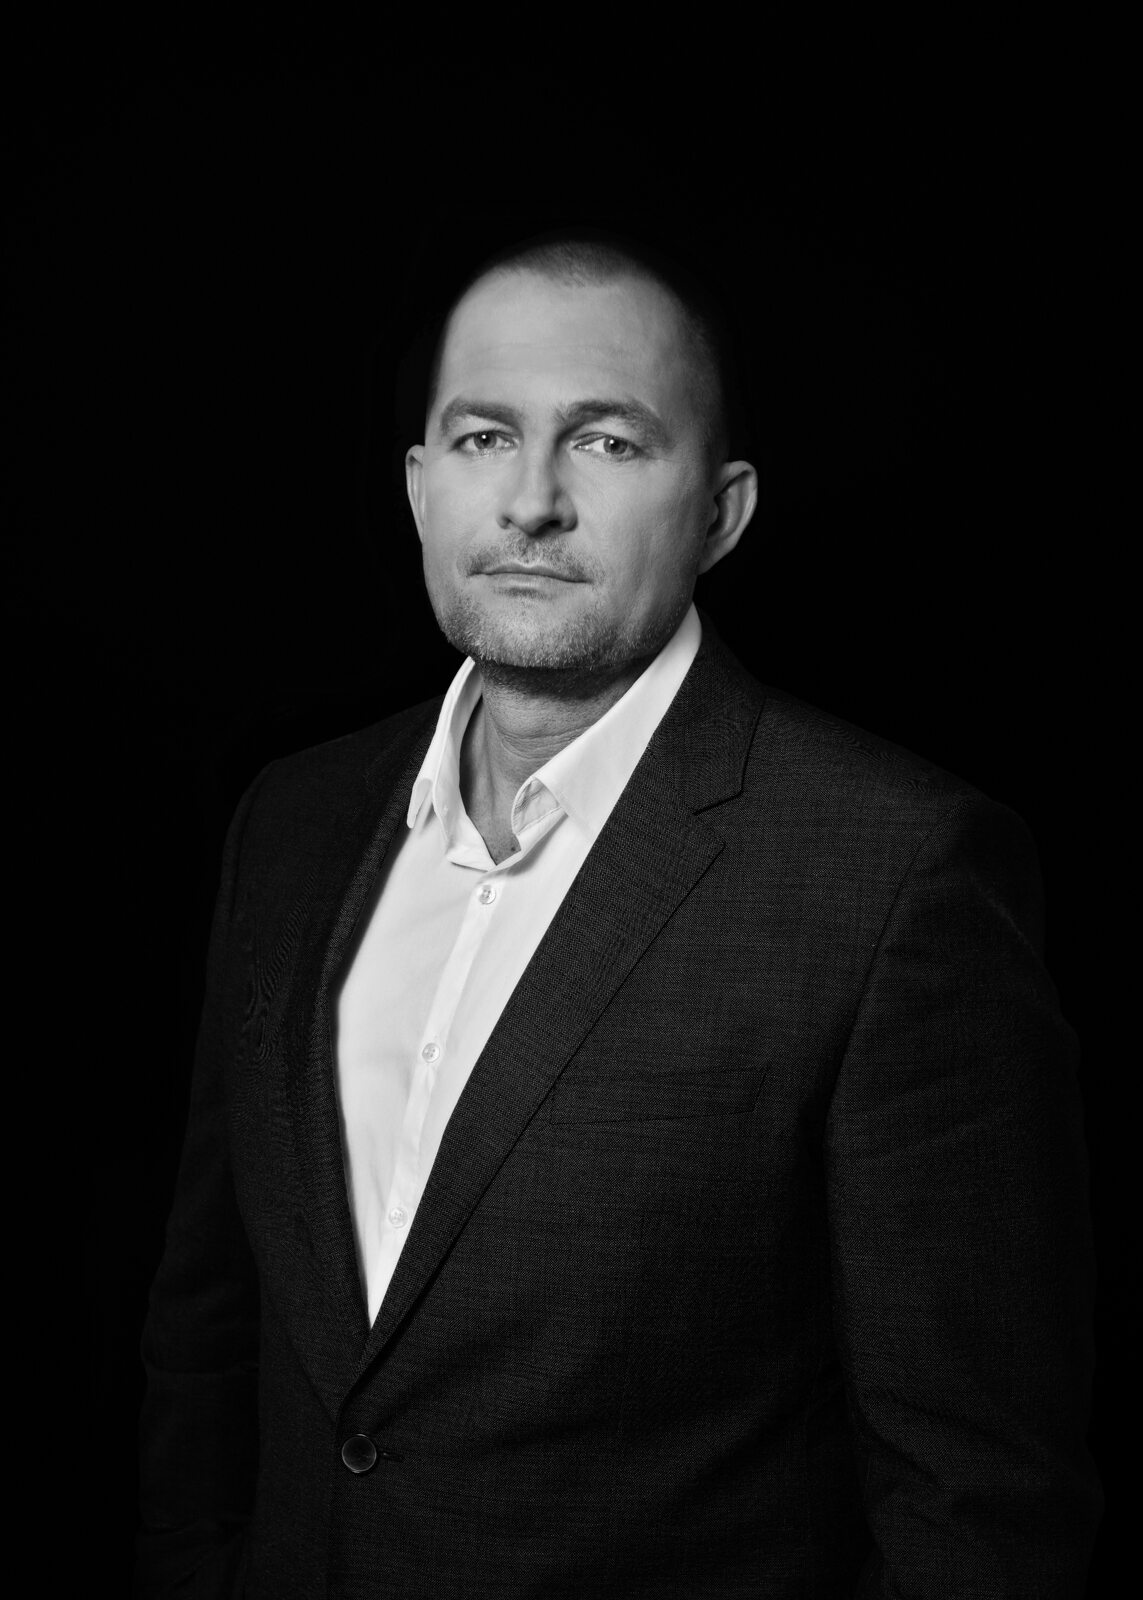 Roman Wyszomirski, prezesa spółki MBR Finanse S.A.